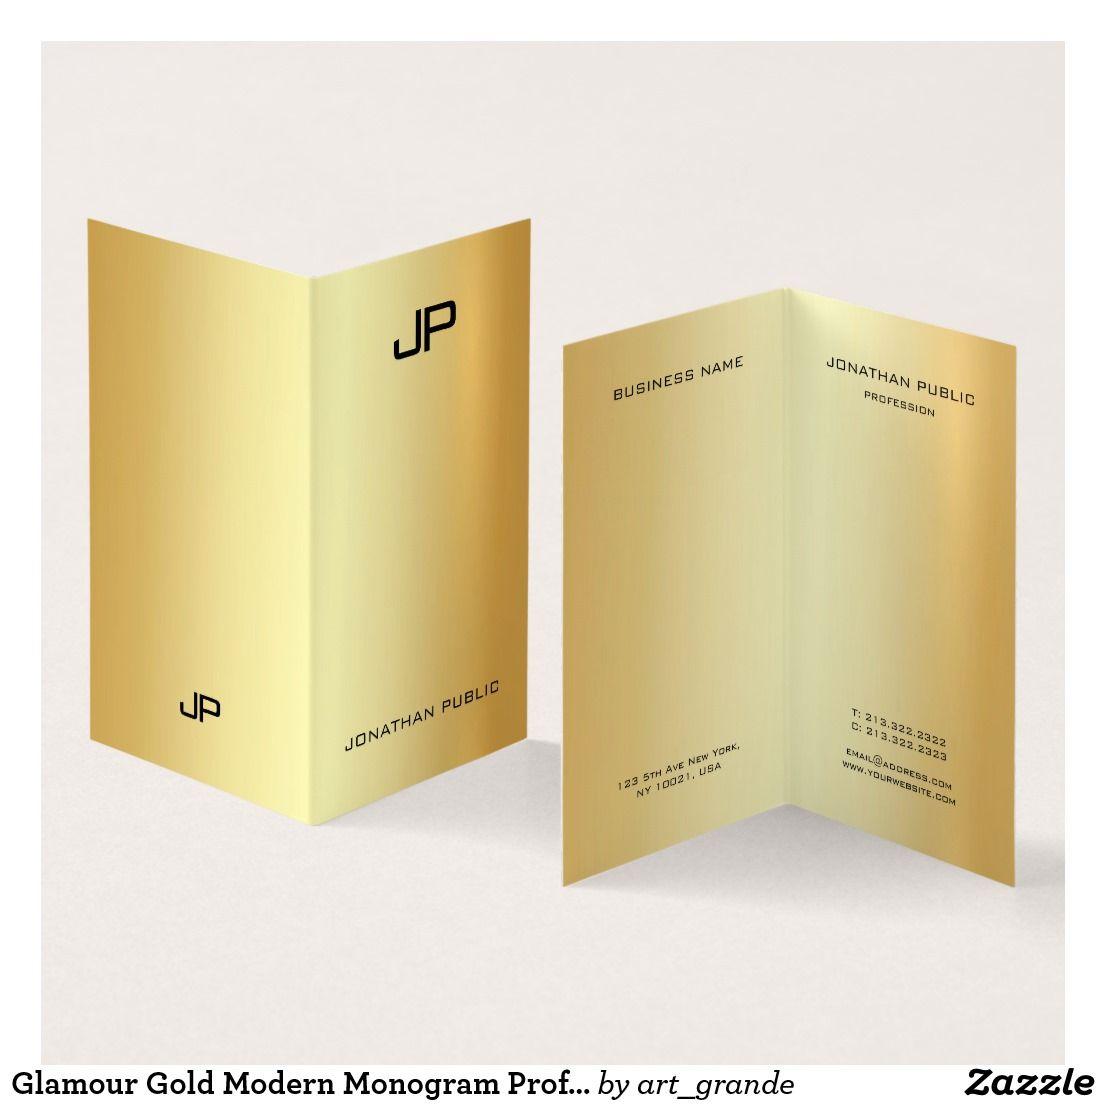 Glamour Gold Modern Monogram Professional Elegant Business